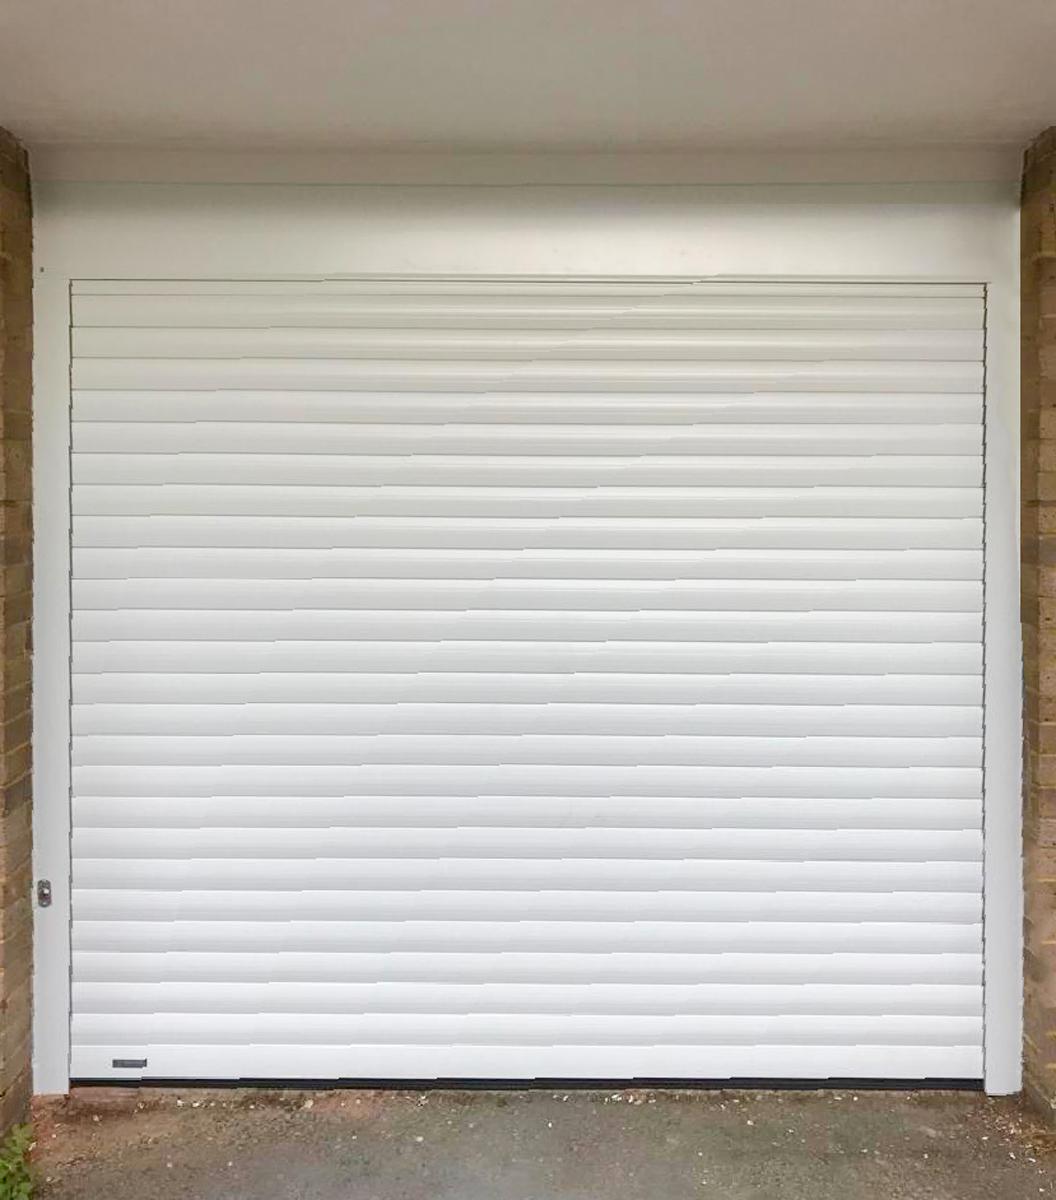 Seceuroglide Classic Roller Garage Door in White